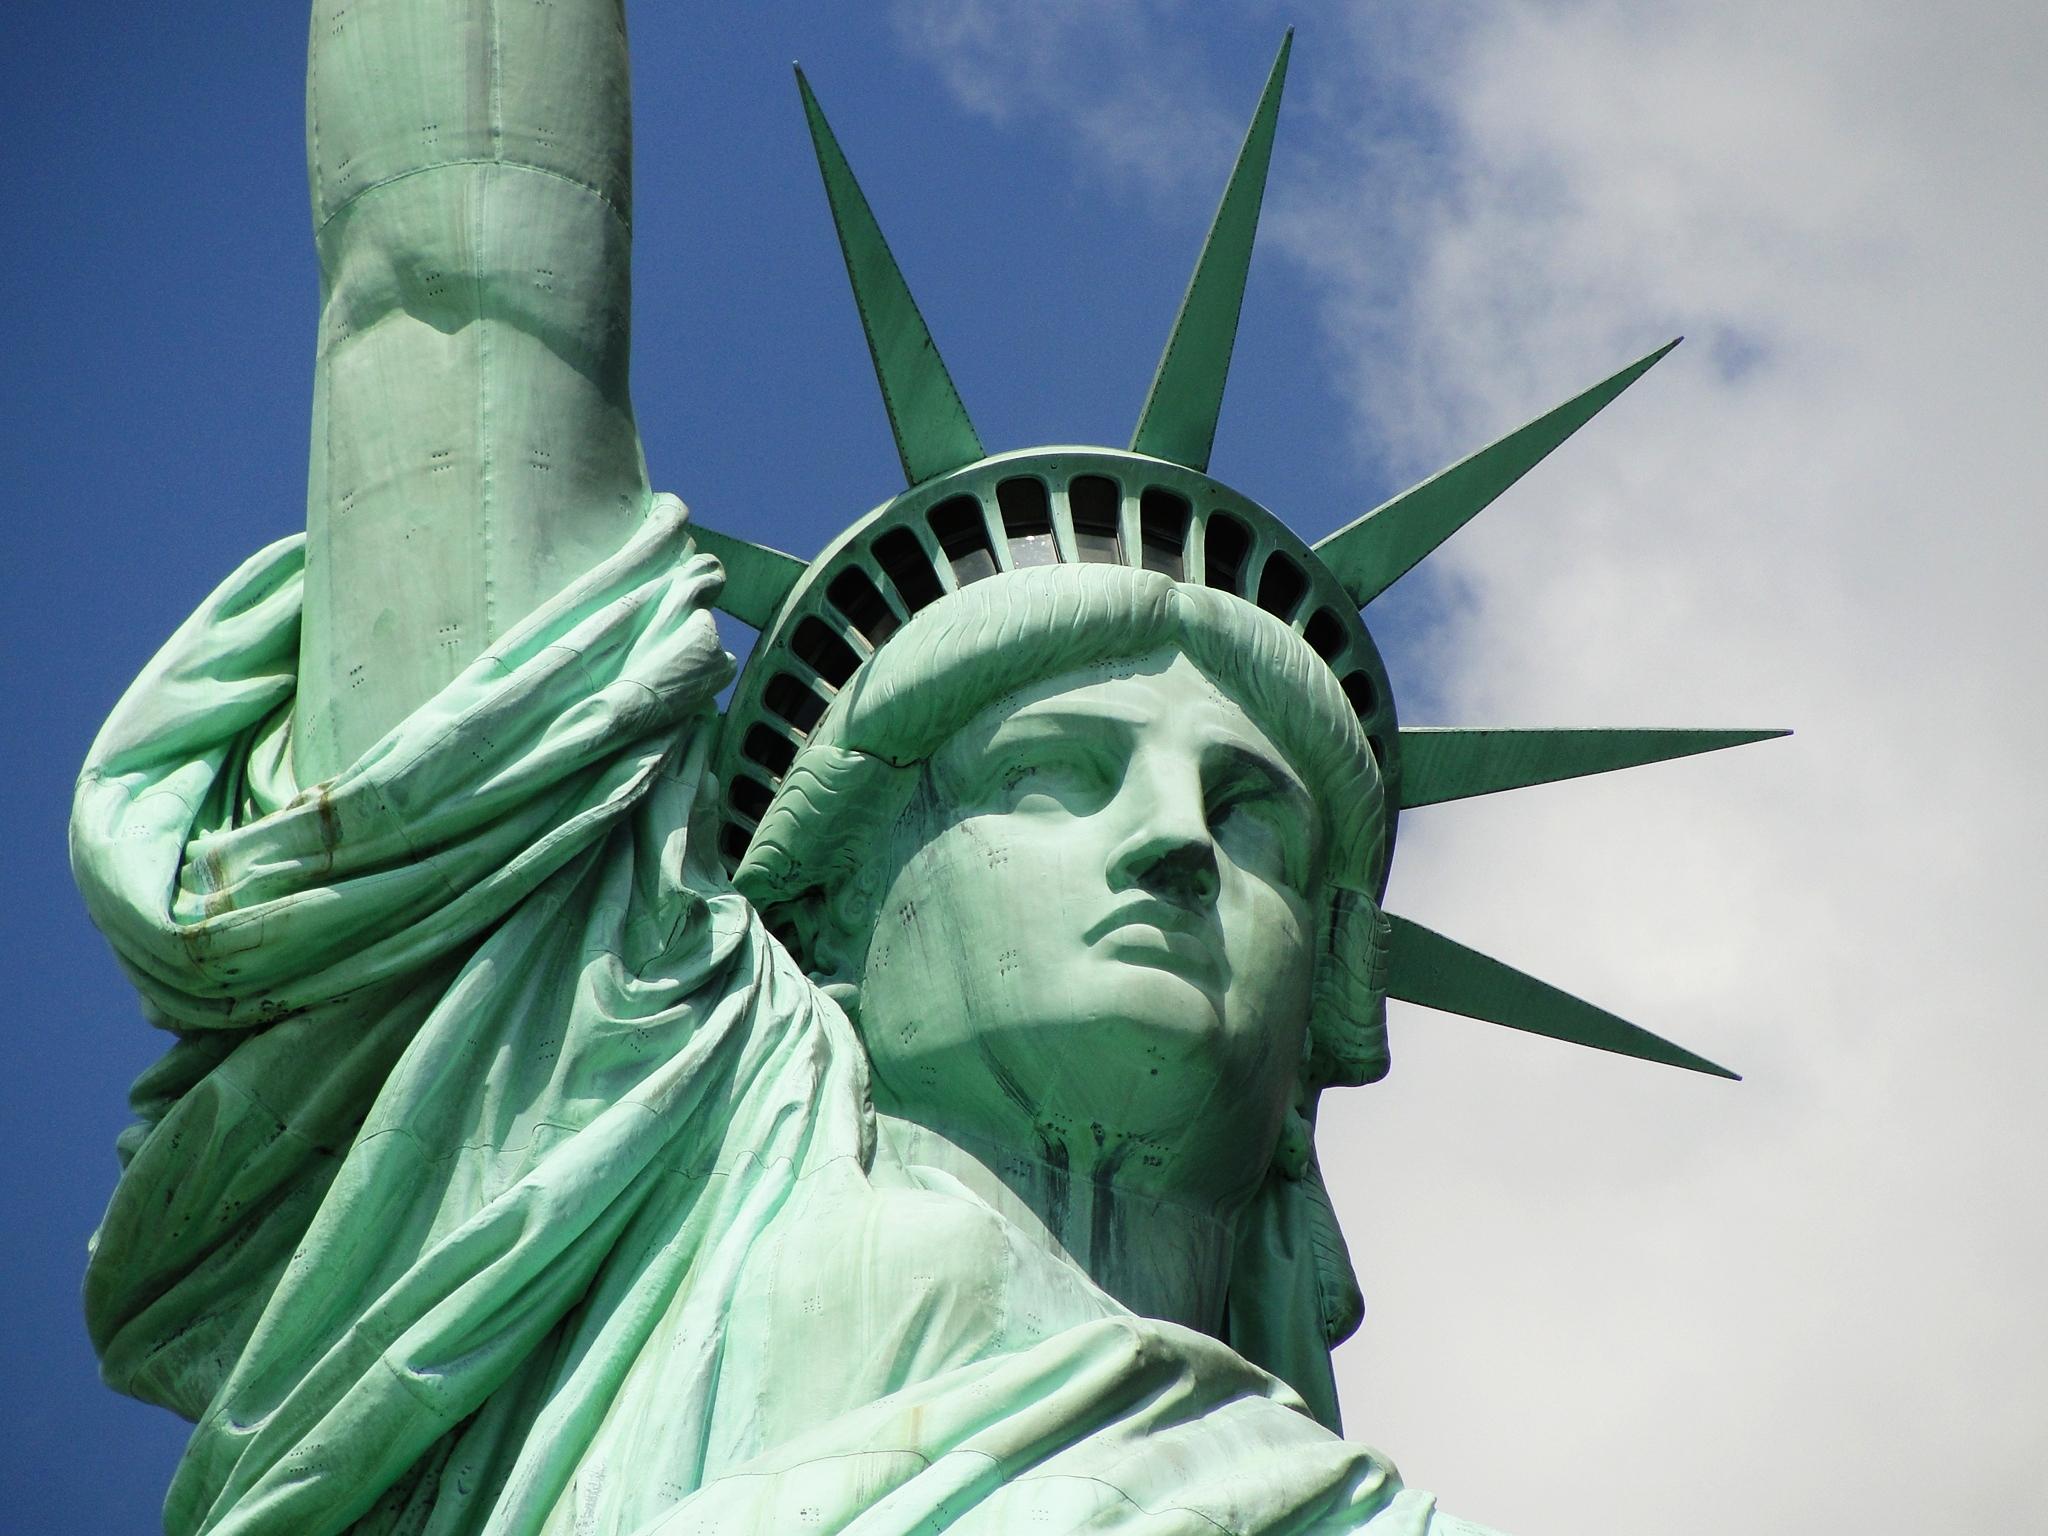 Estatua de la libertad 2 contrapicado sep 18 flickr for Interior estatua de la libertad